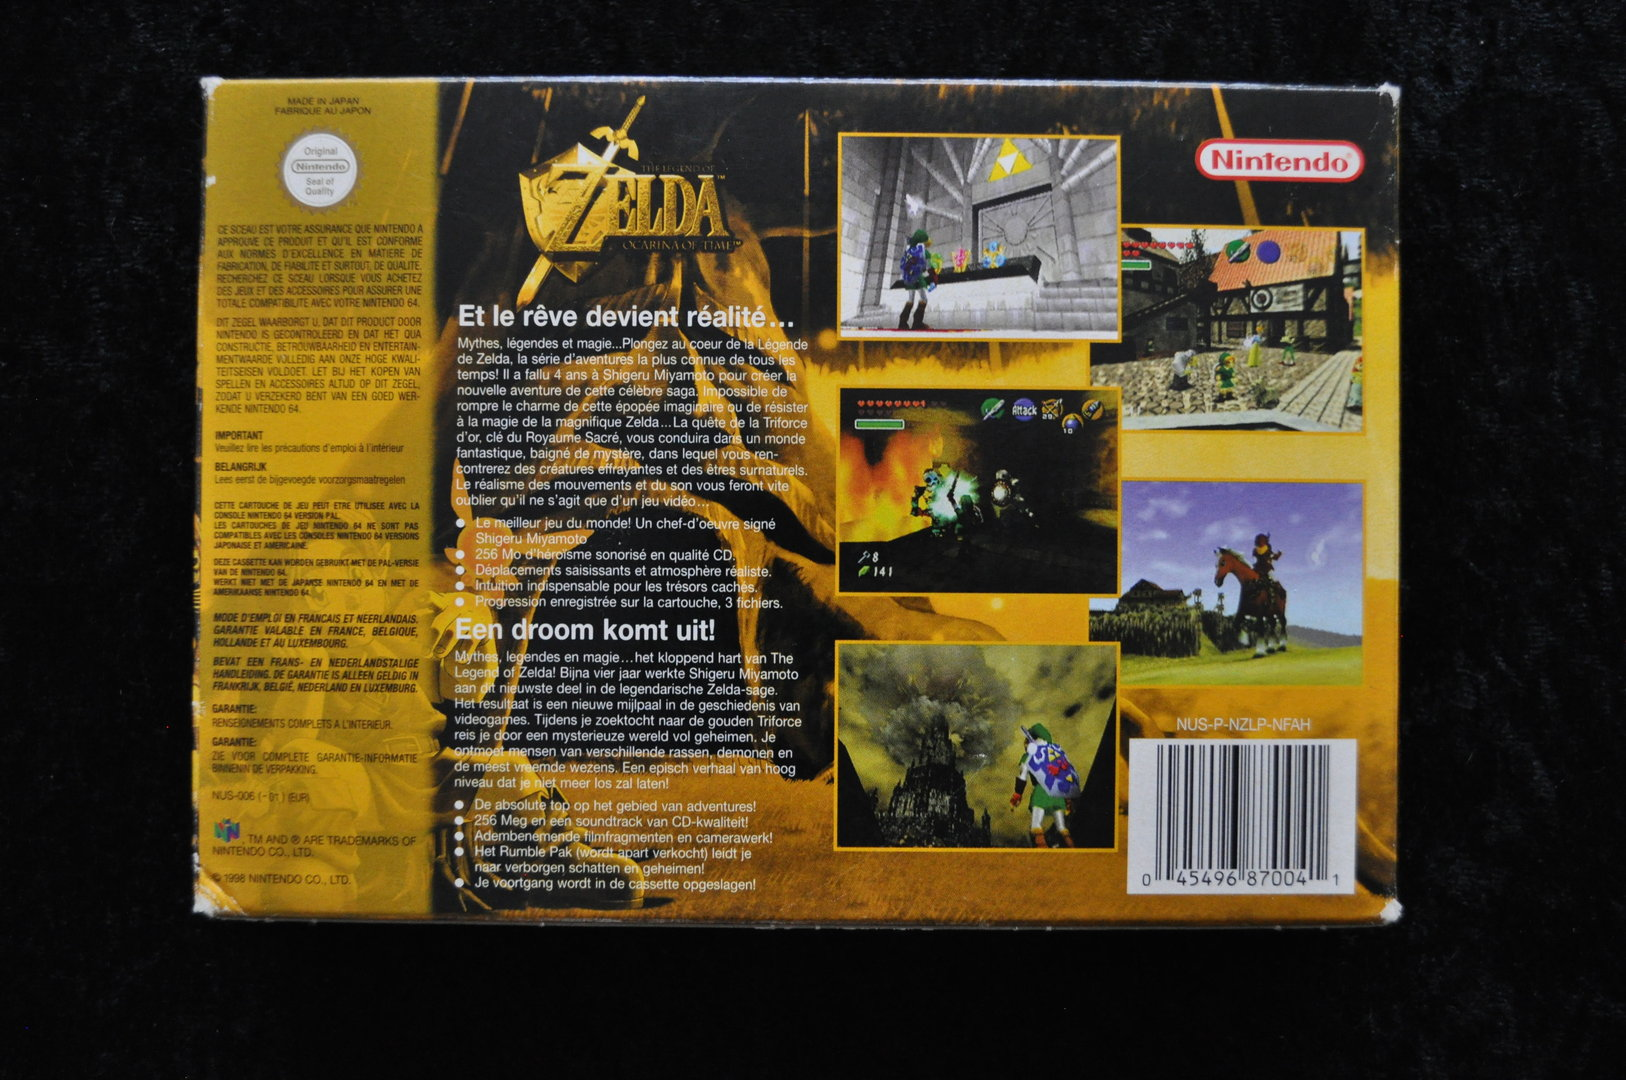 The Legend Of Zelda ocarina of time Nintendo 64 Boxed PAL